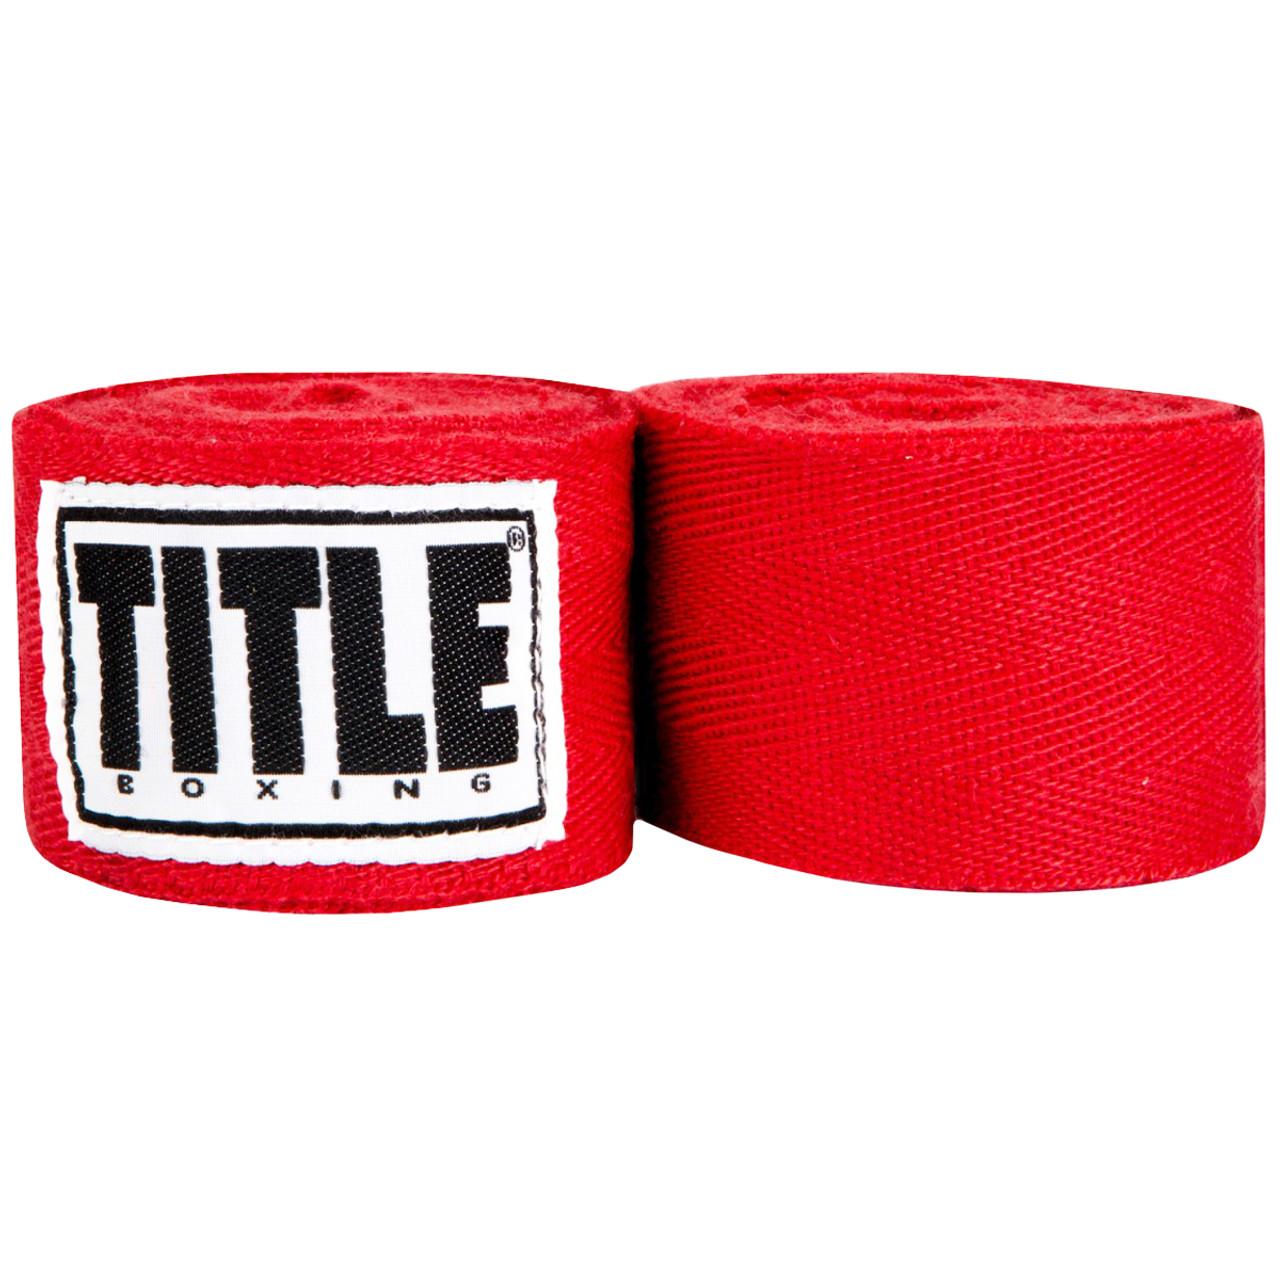 Title Boxing Classic Weave Handwraps